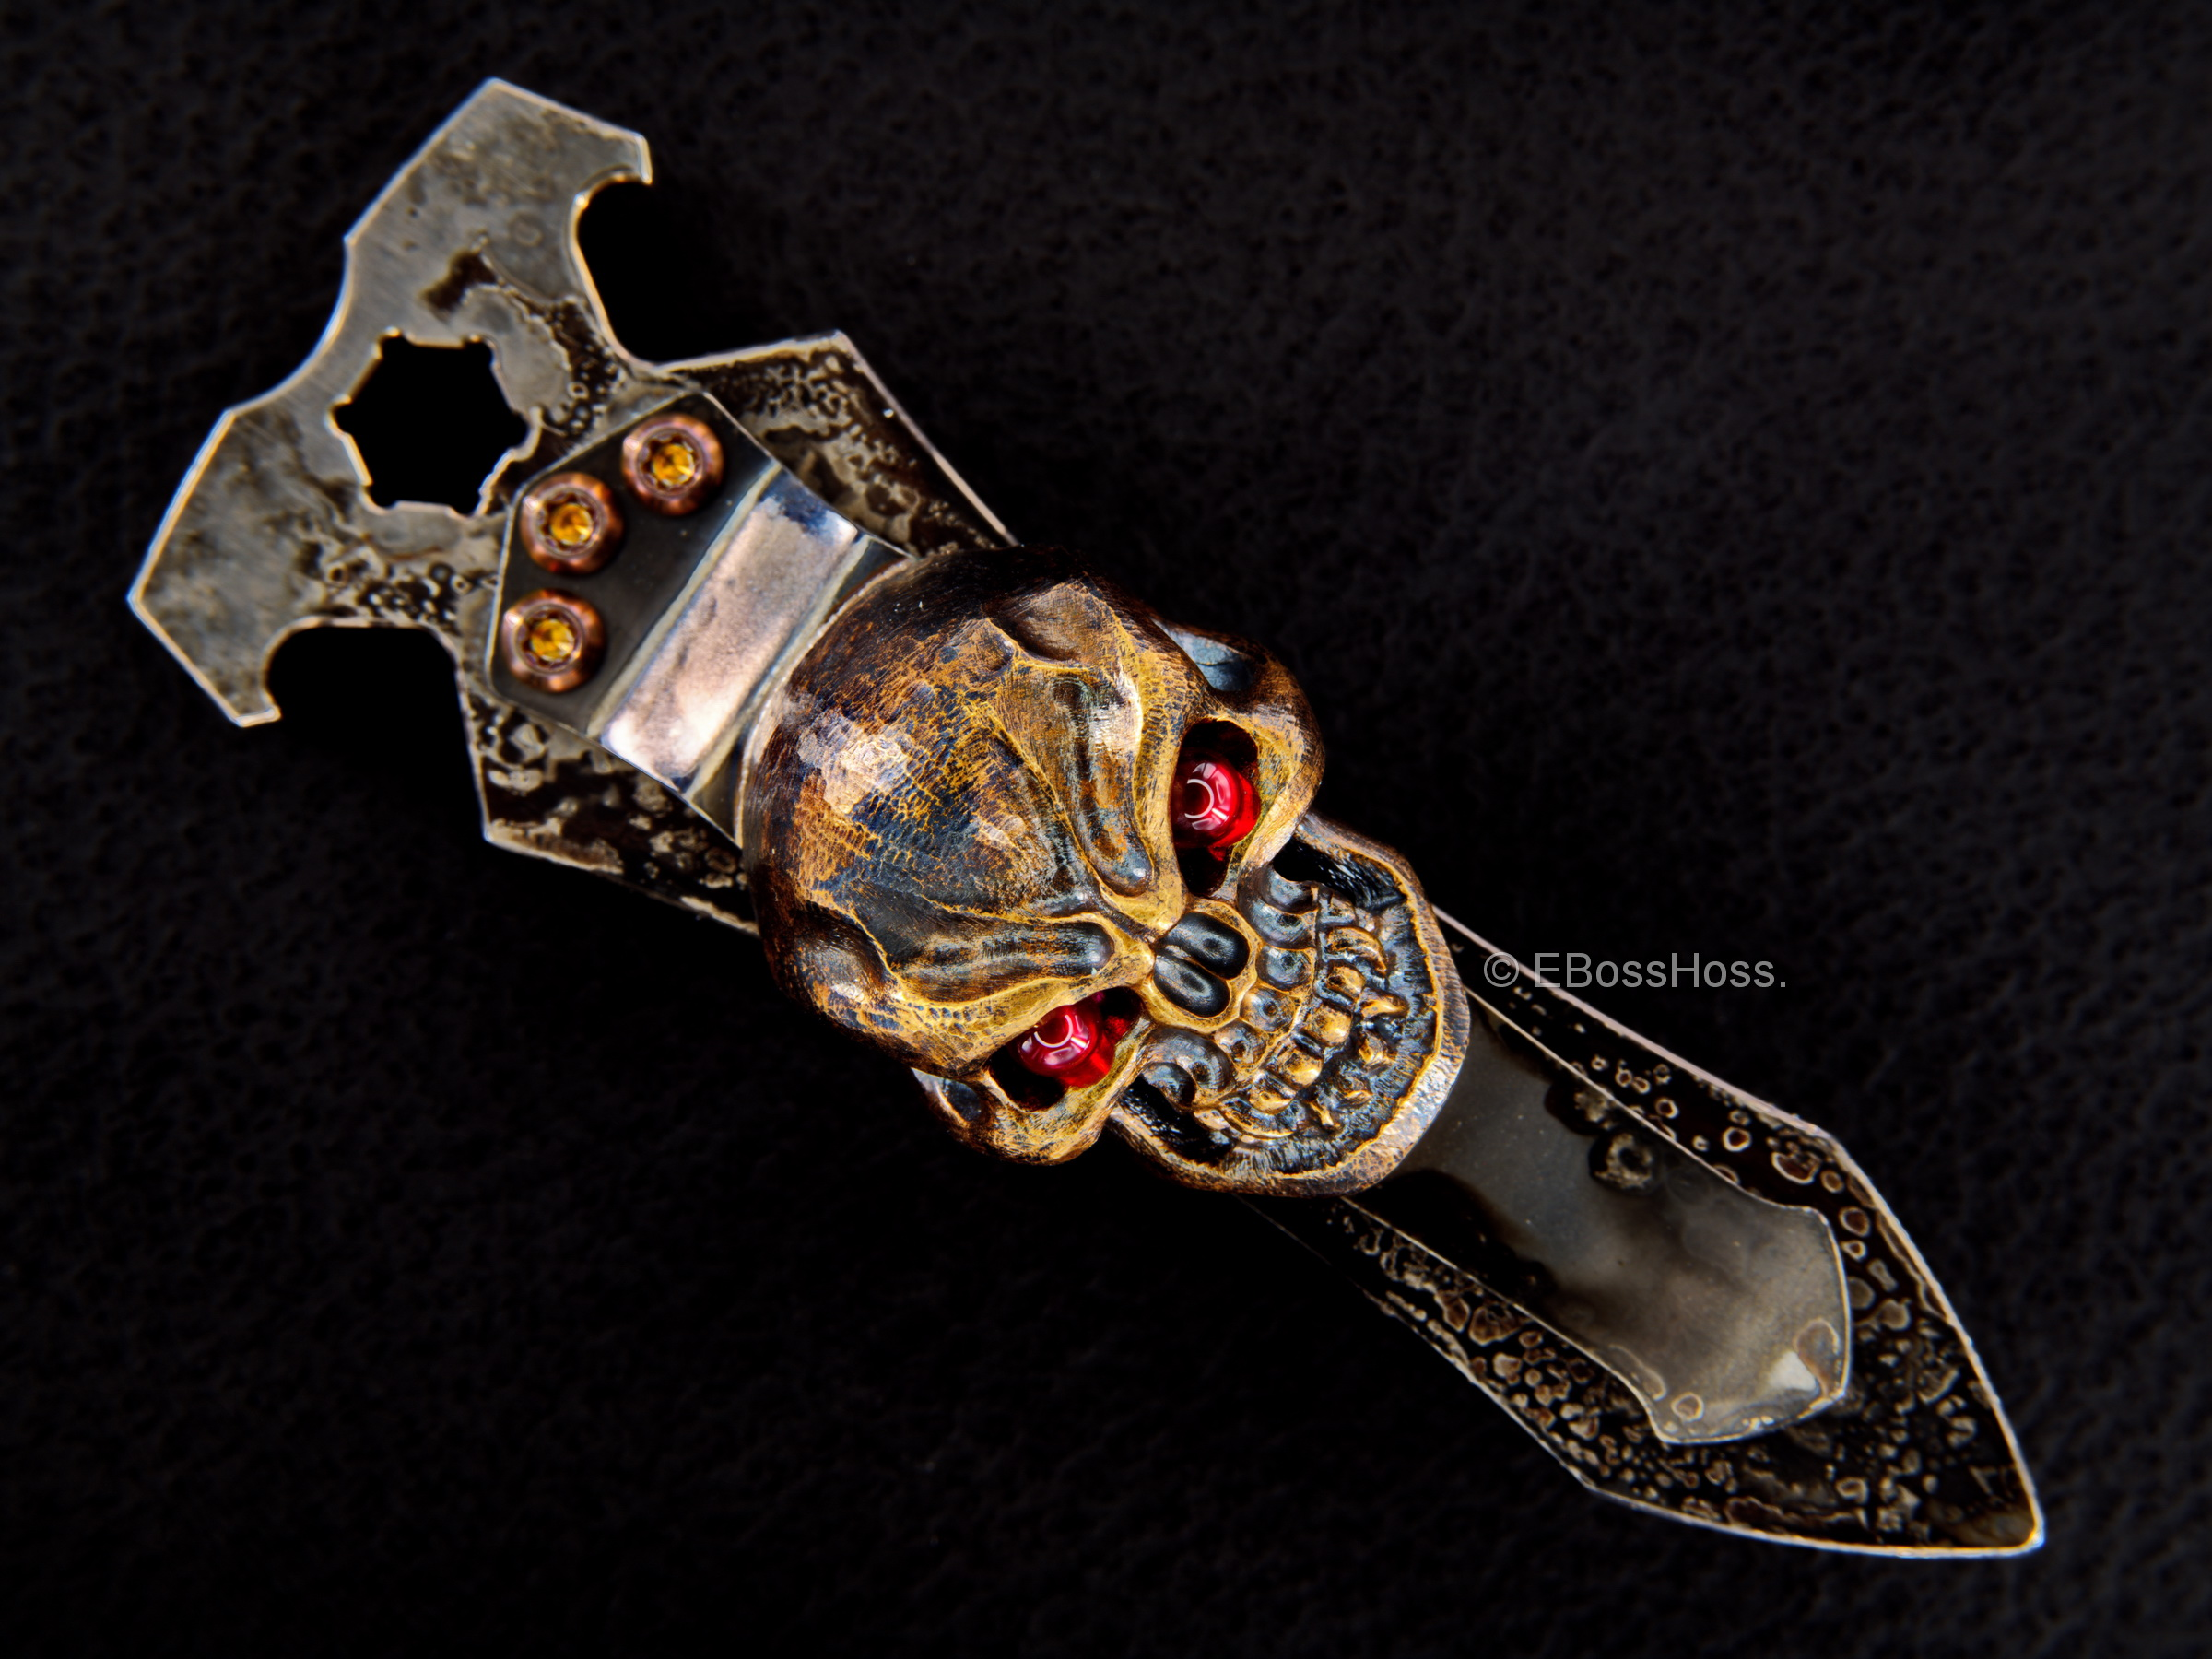 Derrick Obatake ''ONE'' Double-Vigilant Custom Tool / Key-Fob / Money-Clip by Steel Flame